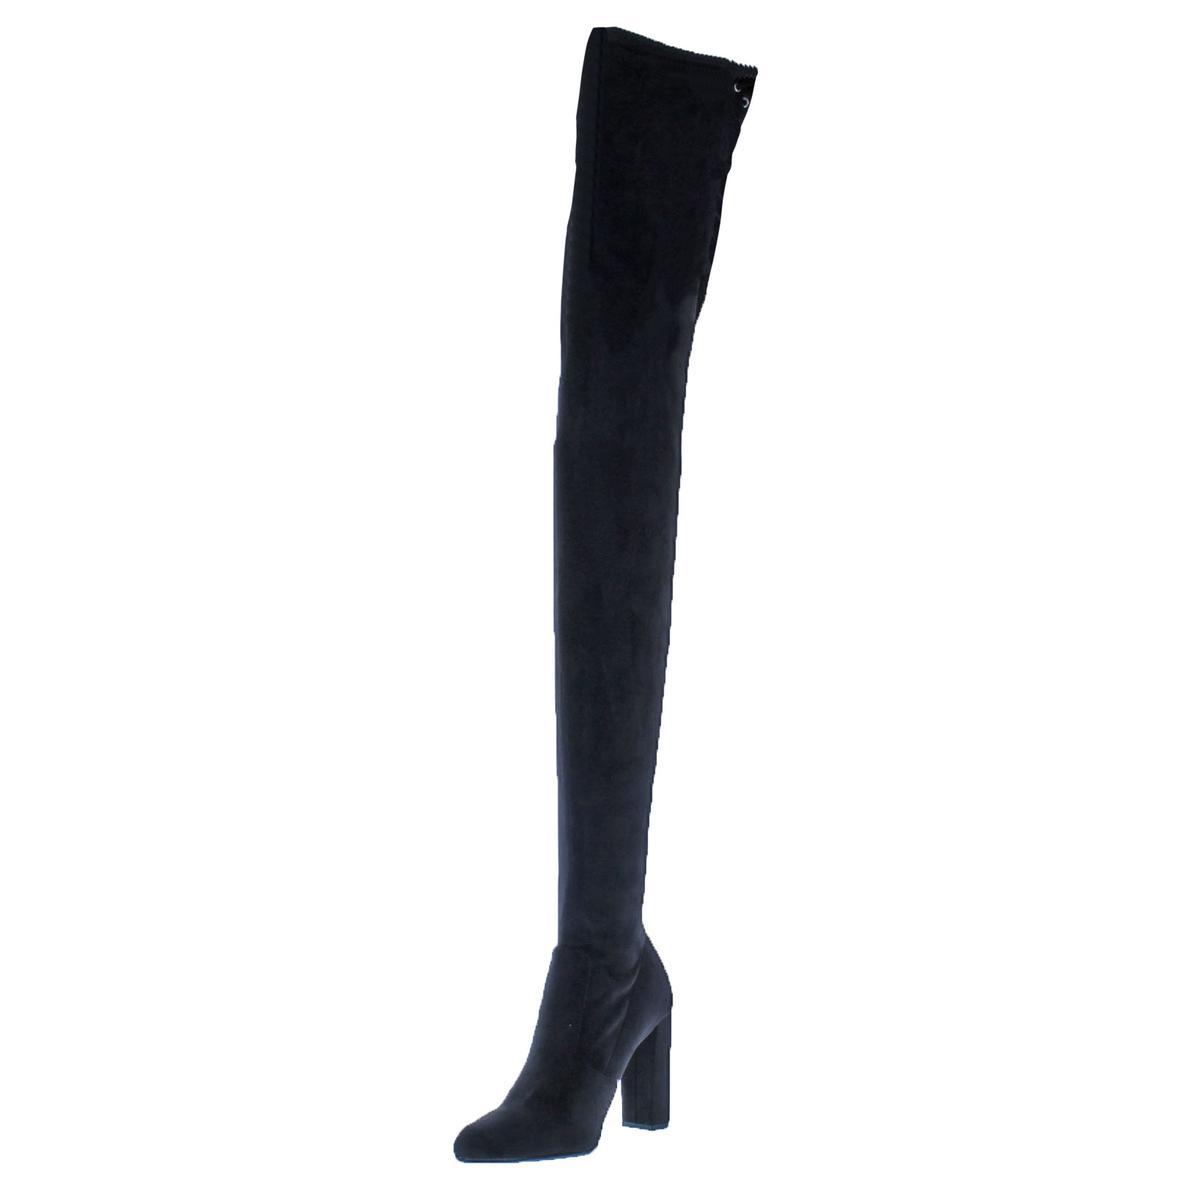 48c0f3e3746 Details about Steve Madden Womens Elektric Black Thigh-High Boots 5.5  Medium (B